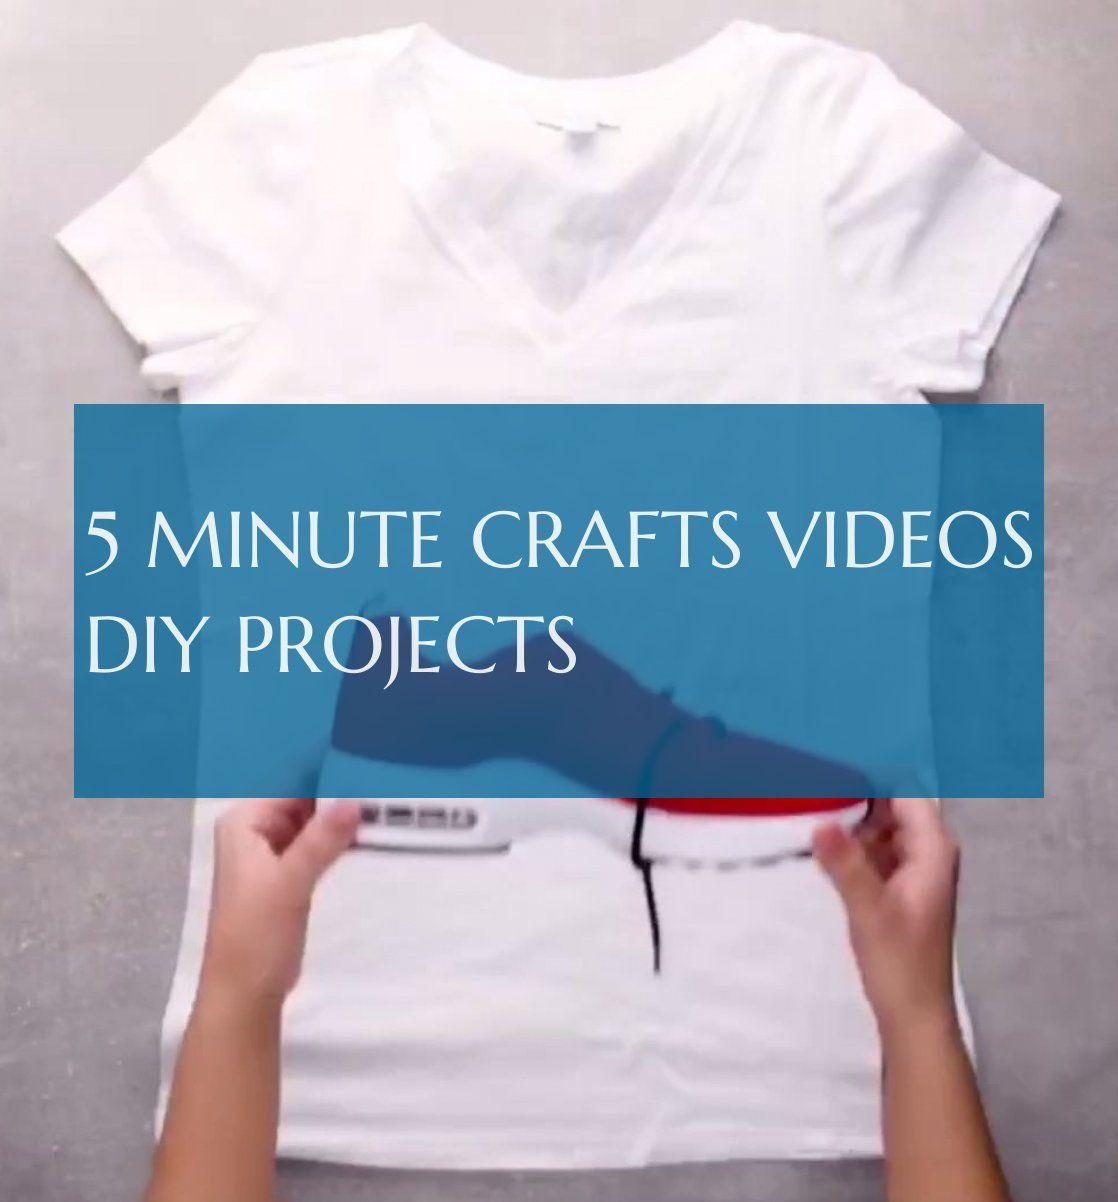 5 minuten bastelvideos diy projekte - #minute #crafts #videos #projects #5minutecraftsvideos